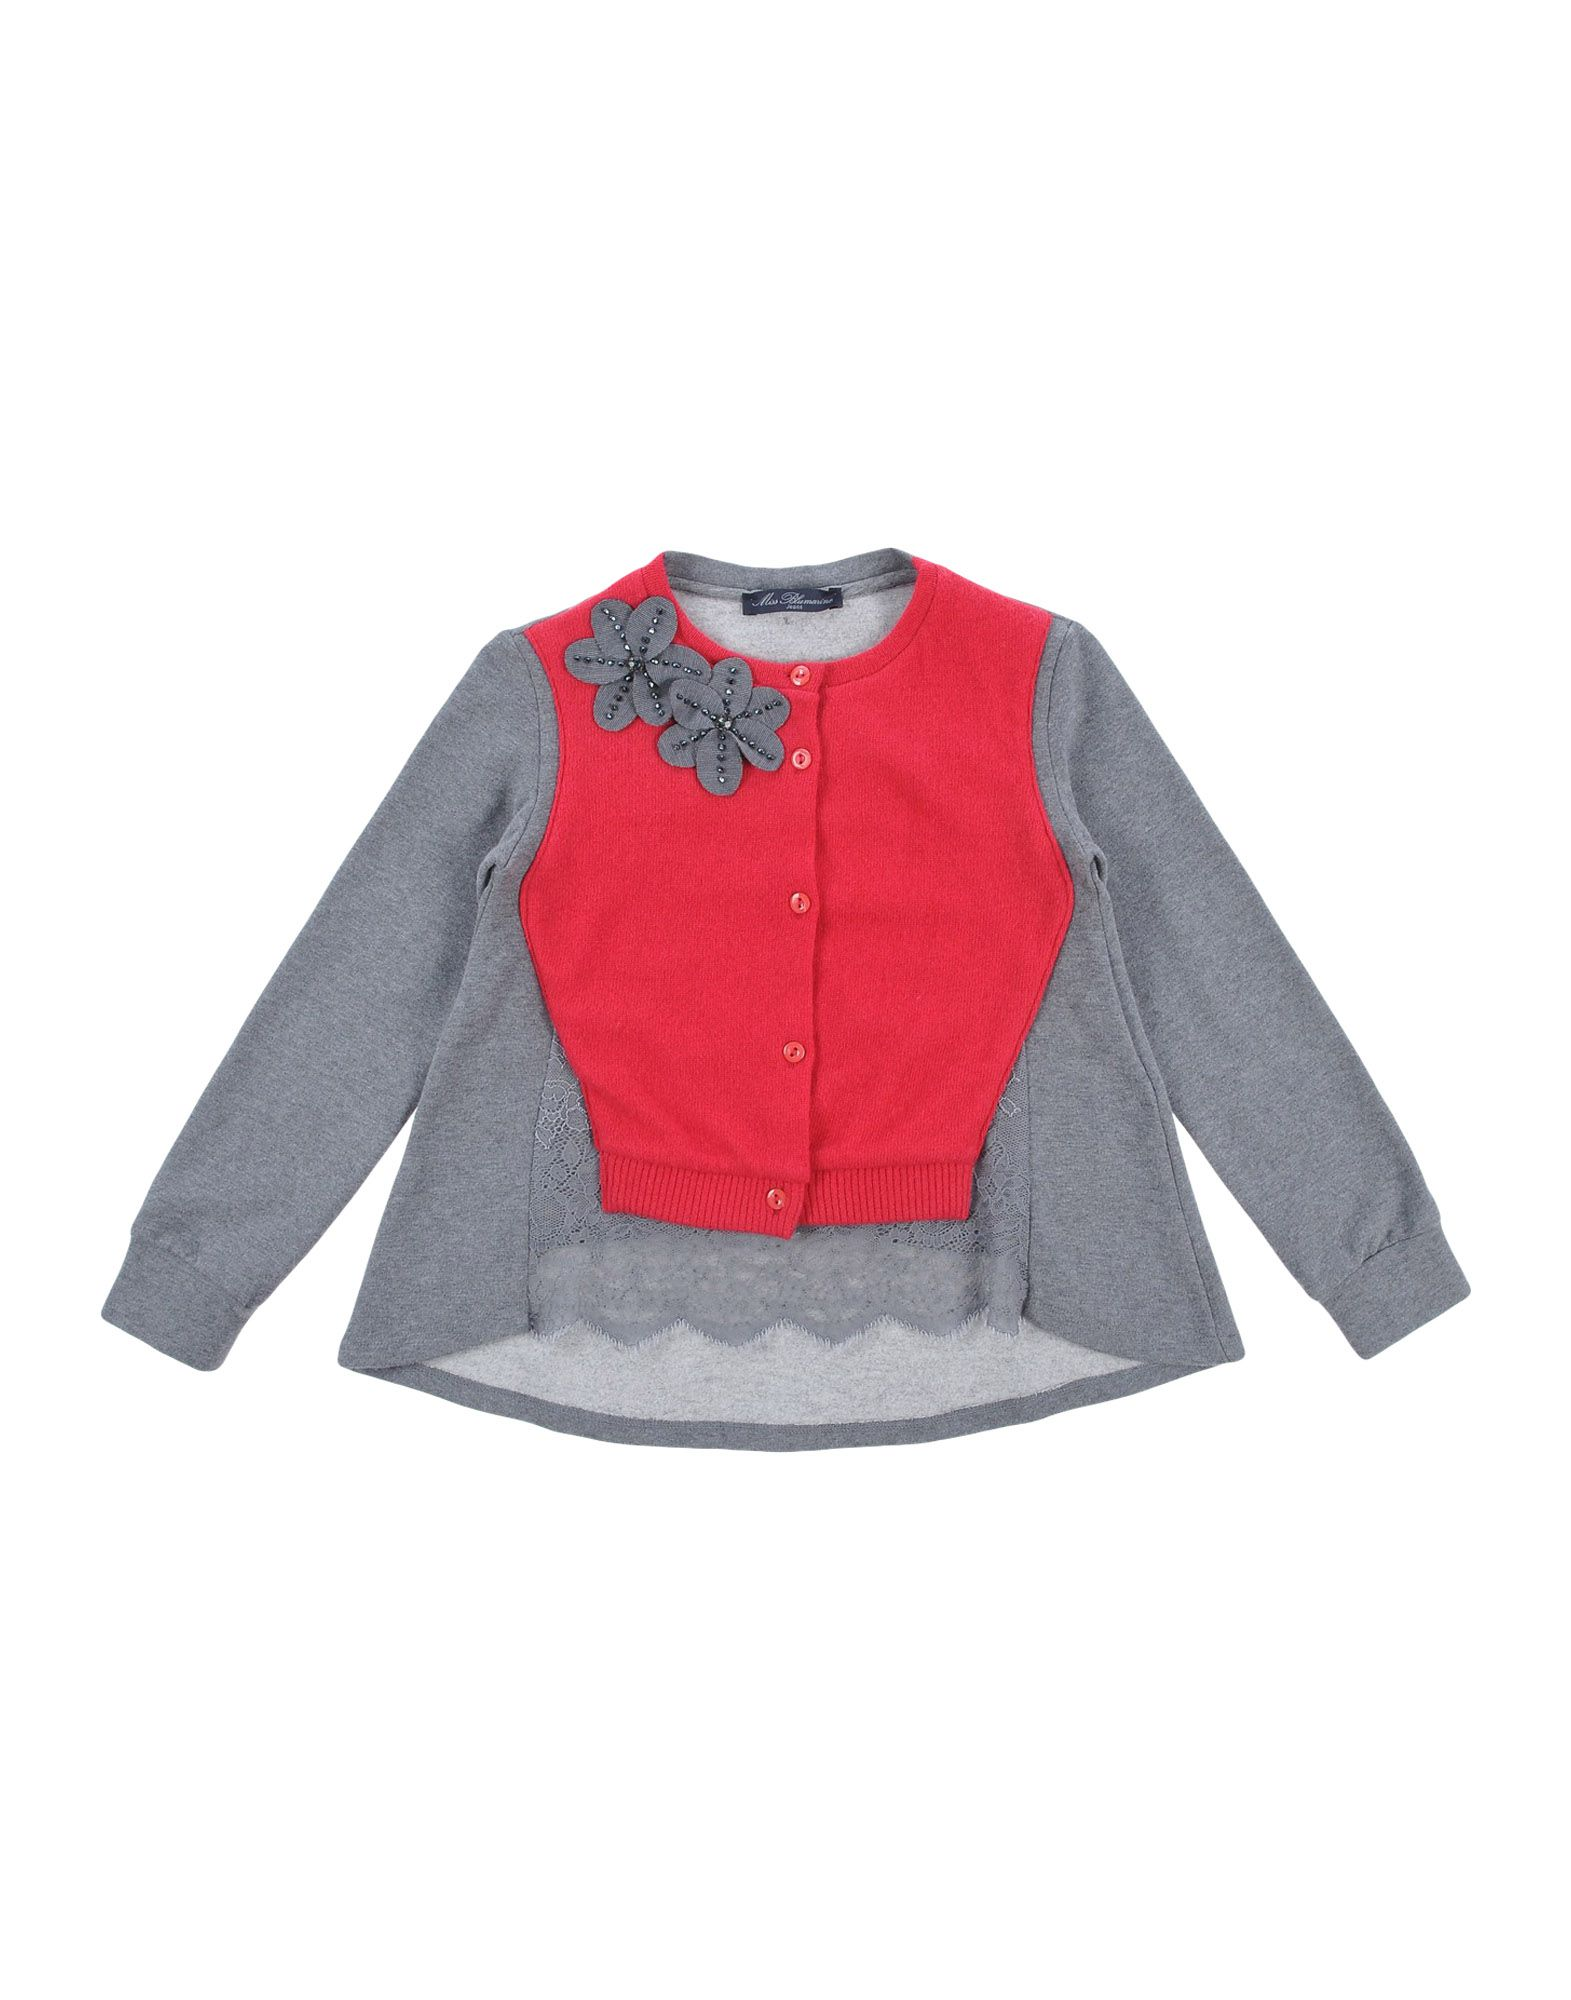 MISS BLUMARINE Sweatshirt in Fuchsia